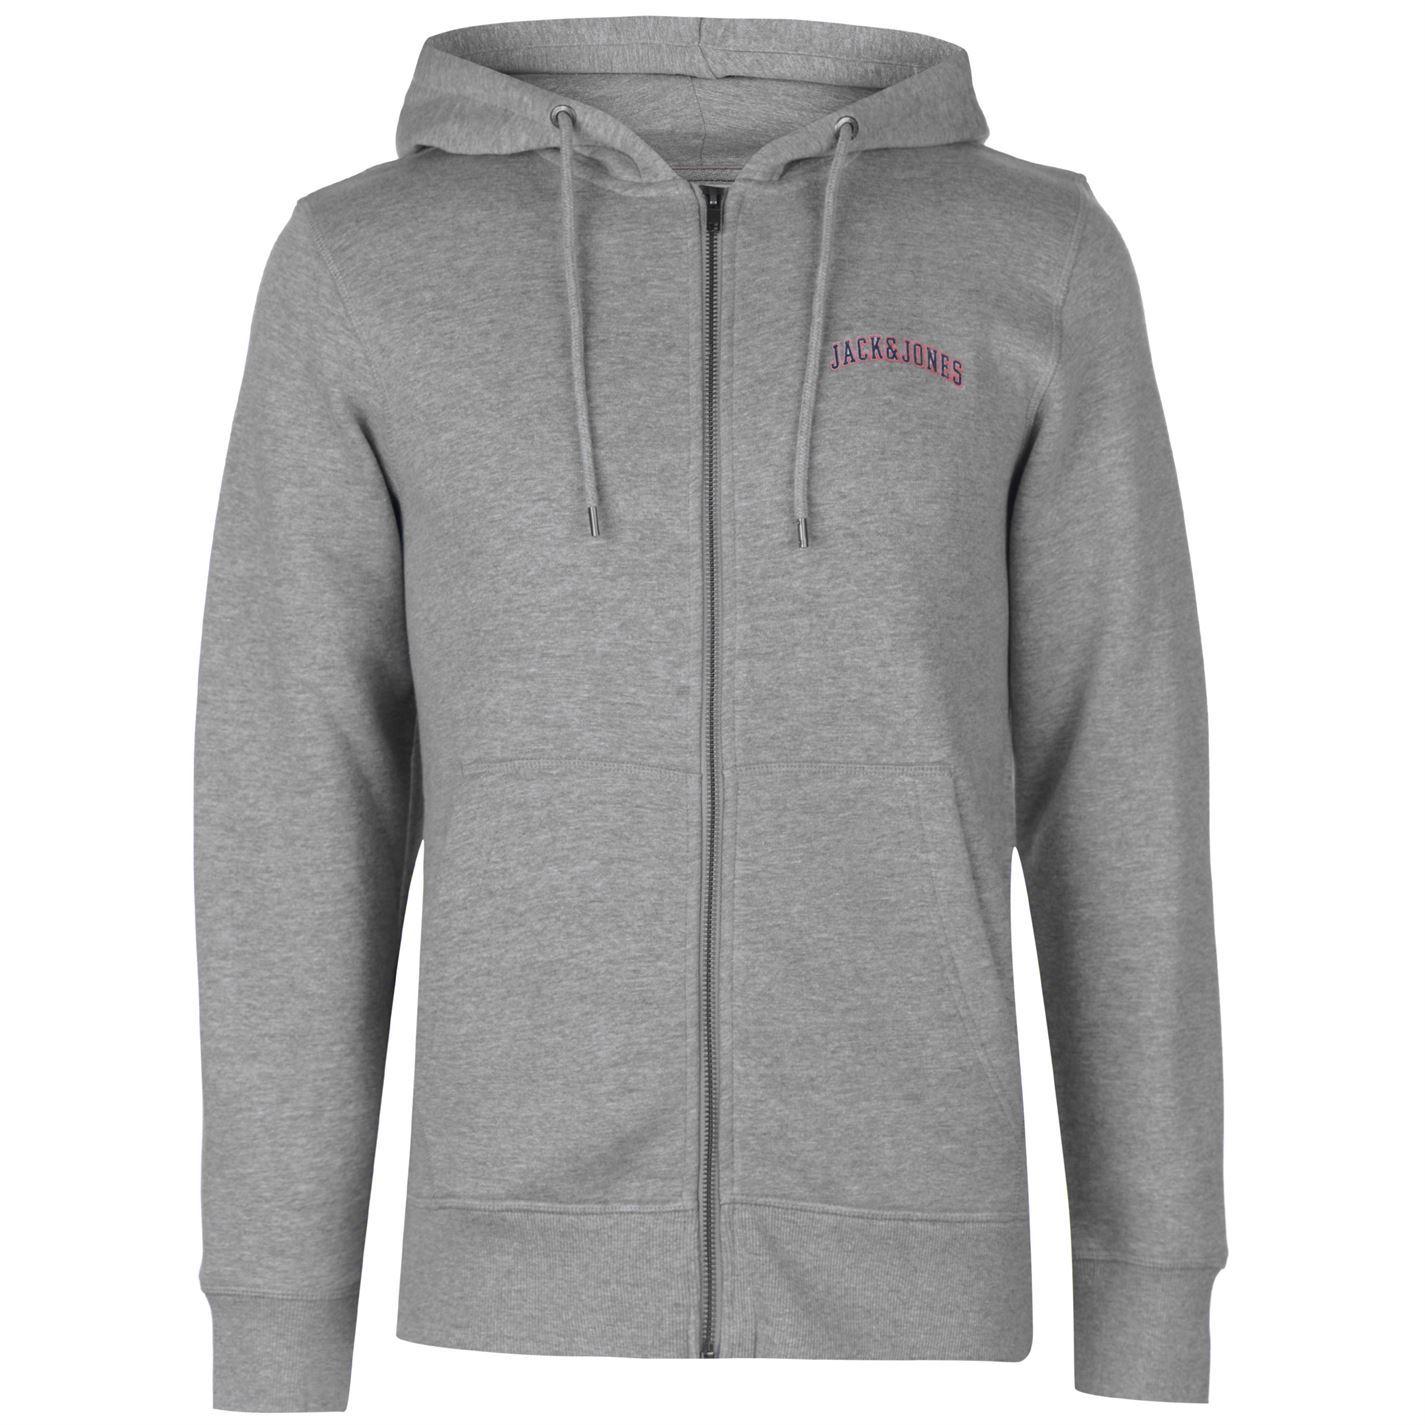 Jack-and-Jones-Originals-Harvey-Zip-Hoodie-Mens-Hooded-Top-Sweater-Outerwear thumbnail 3